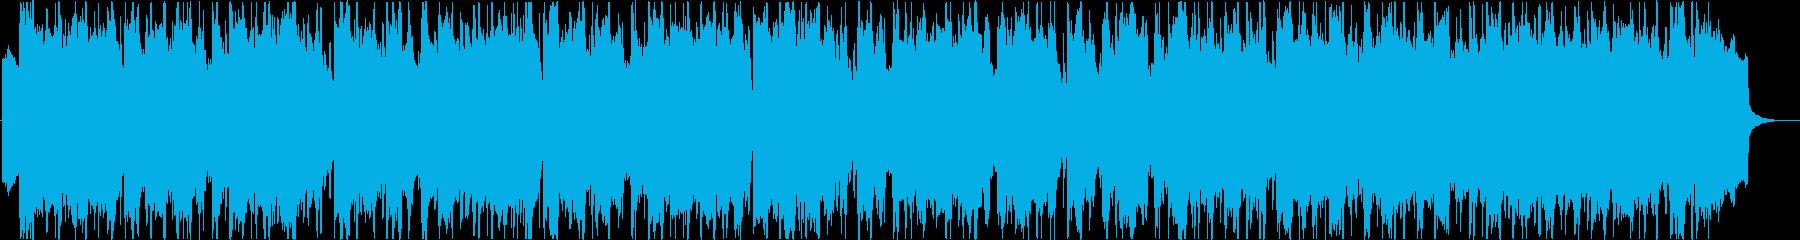 Loose and refreshing tropical ukulele Hawaiian b's reproduced waveform